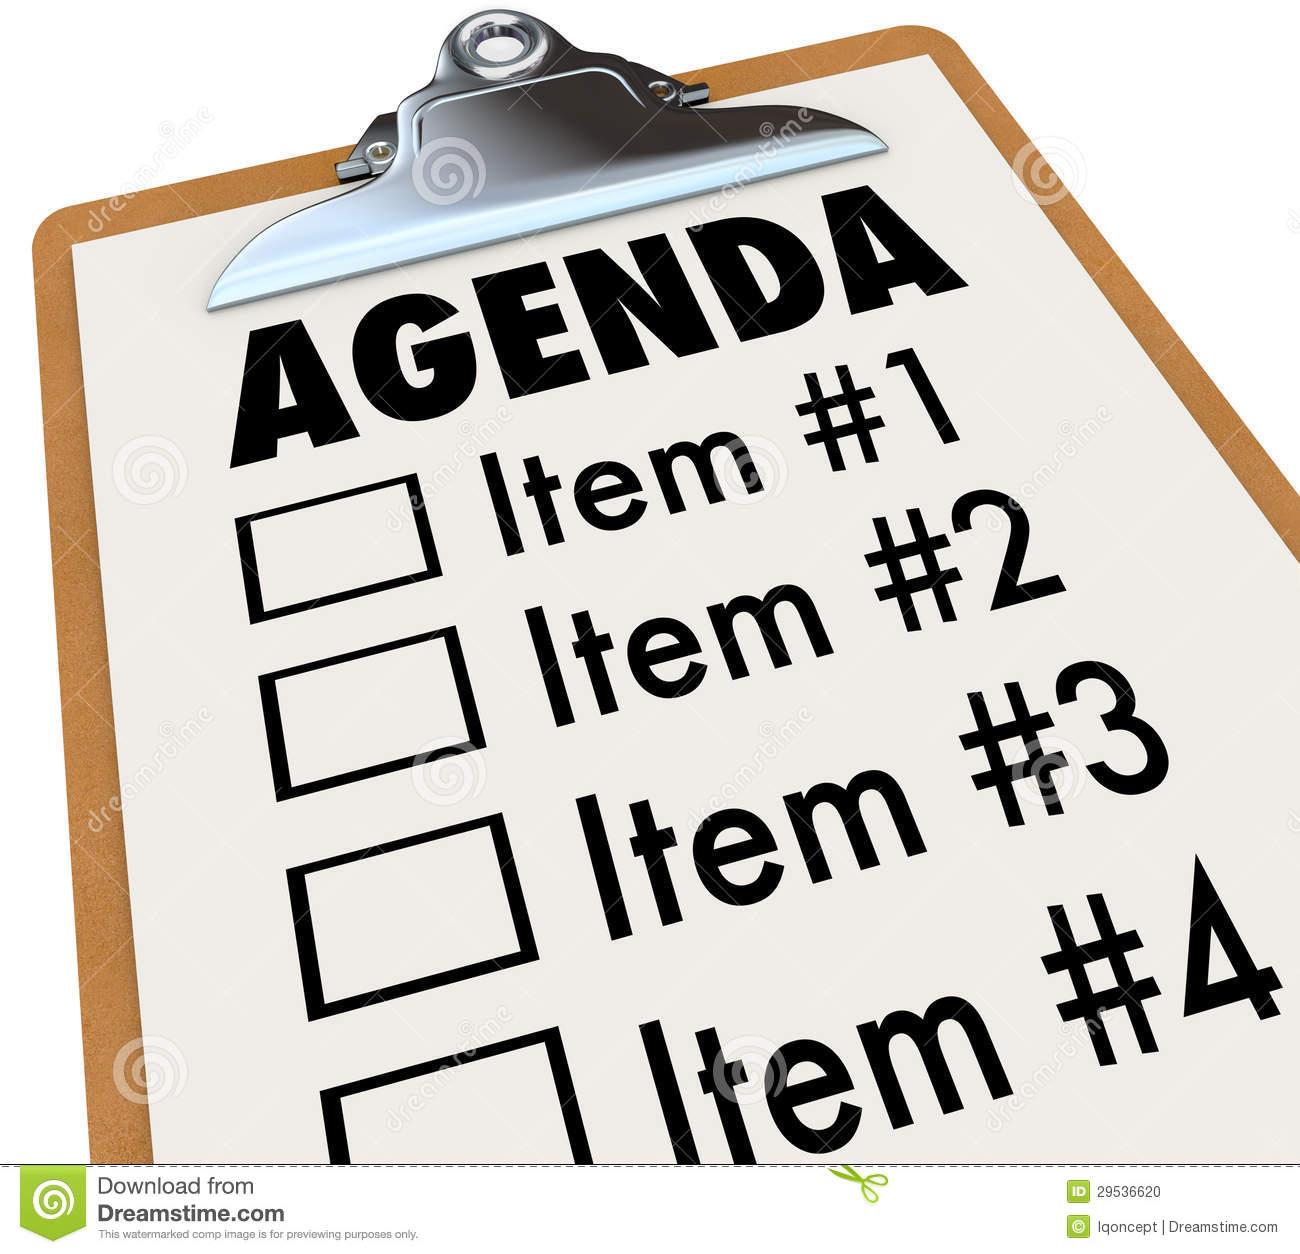 Meeting Agenda Clipart - Clipart Kid